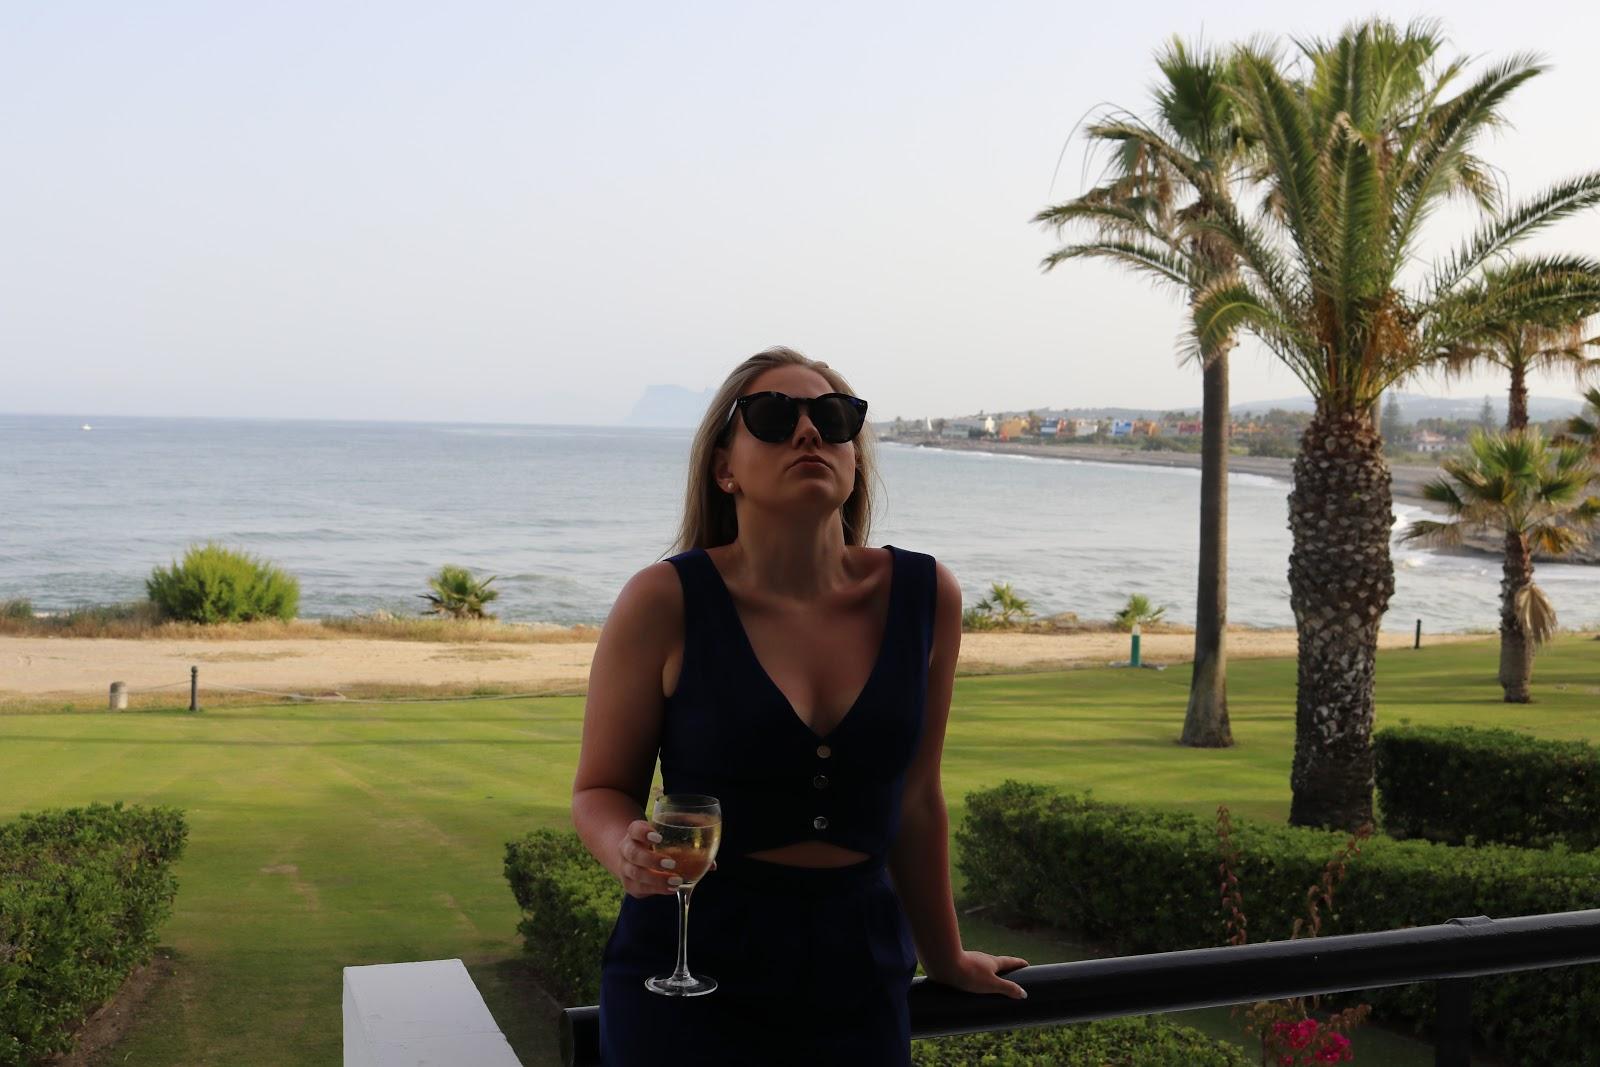 Blonde girl wearing Little Mistress blue jumpsuit, drinking a glass of wine on a balcony in Sotogrande, Spain